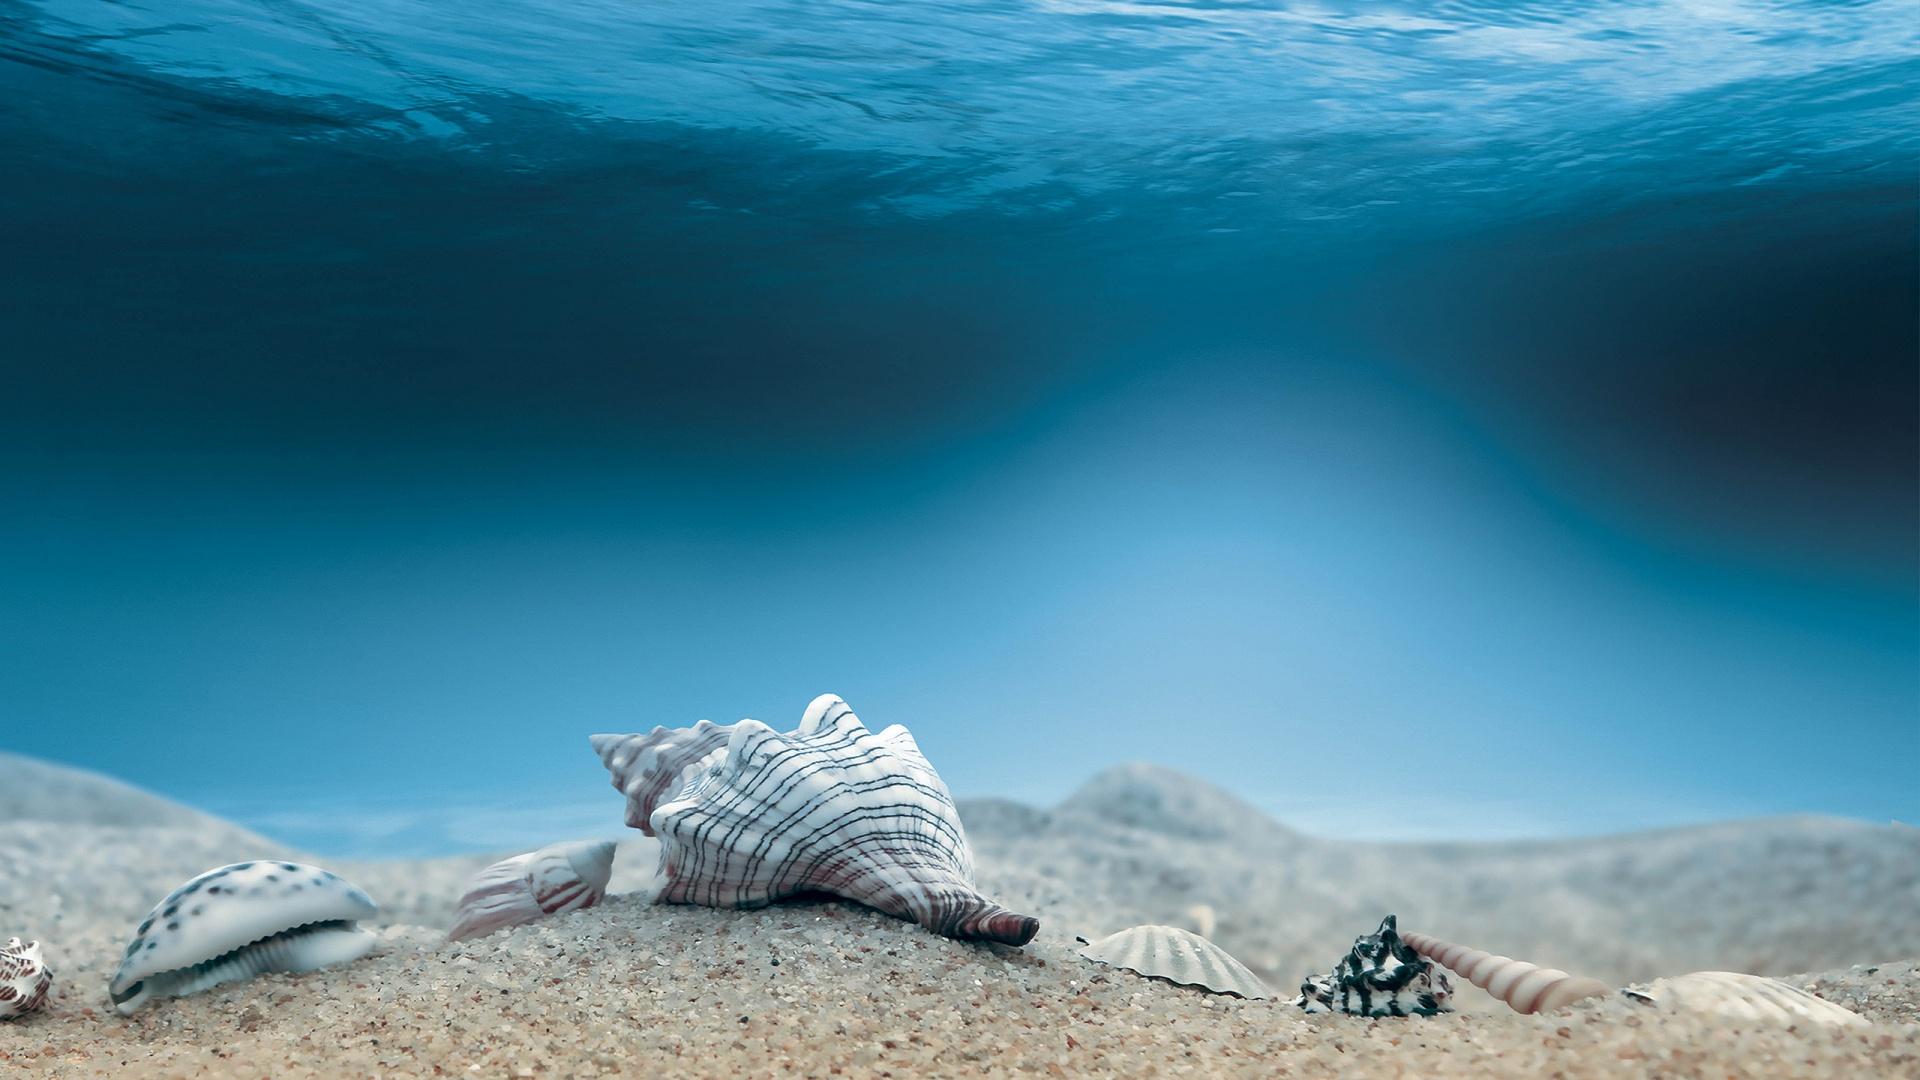 art ocean sea water underwater shells sand wallpaper background 1920x1080